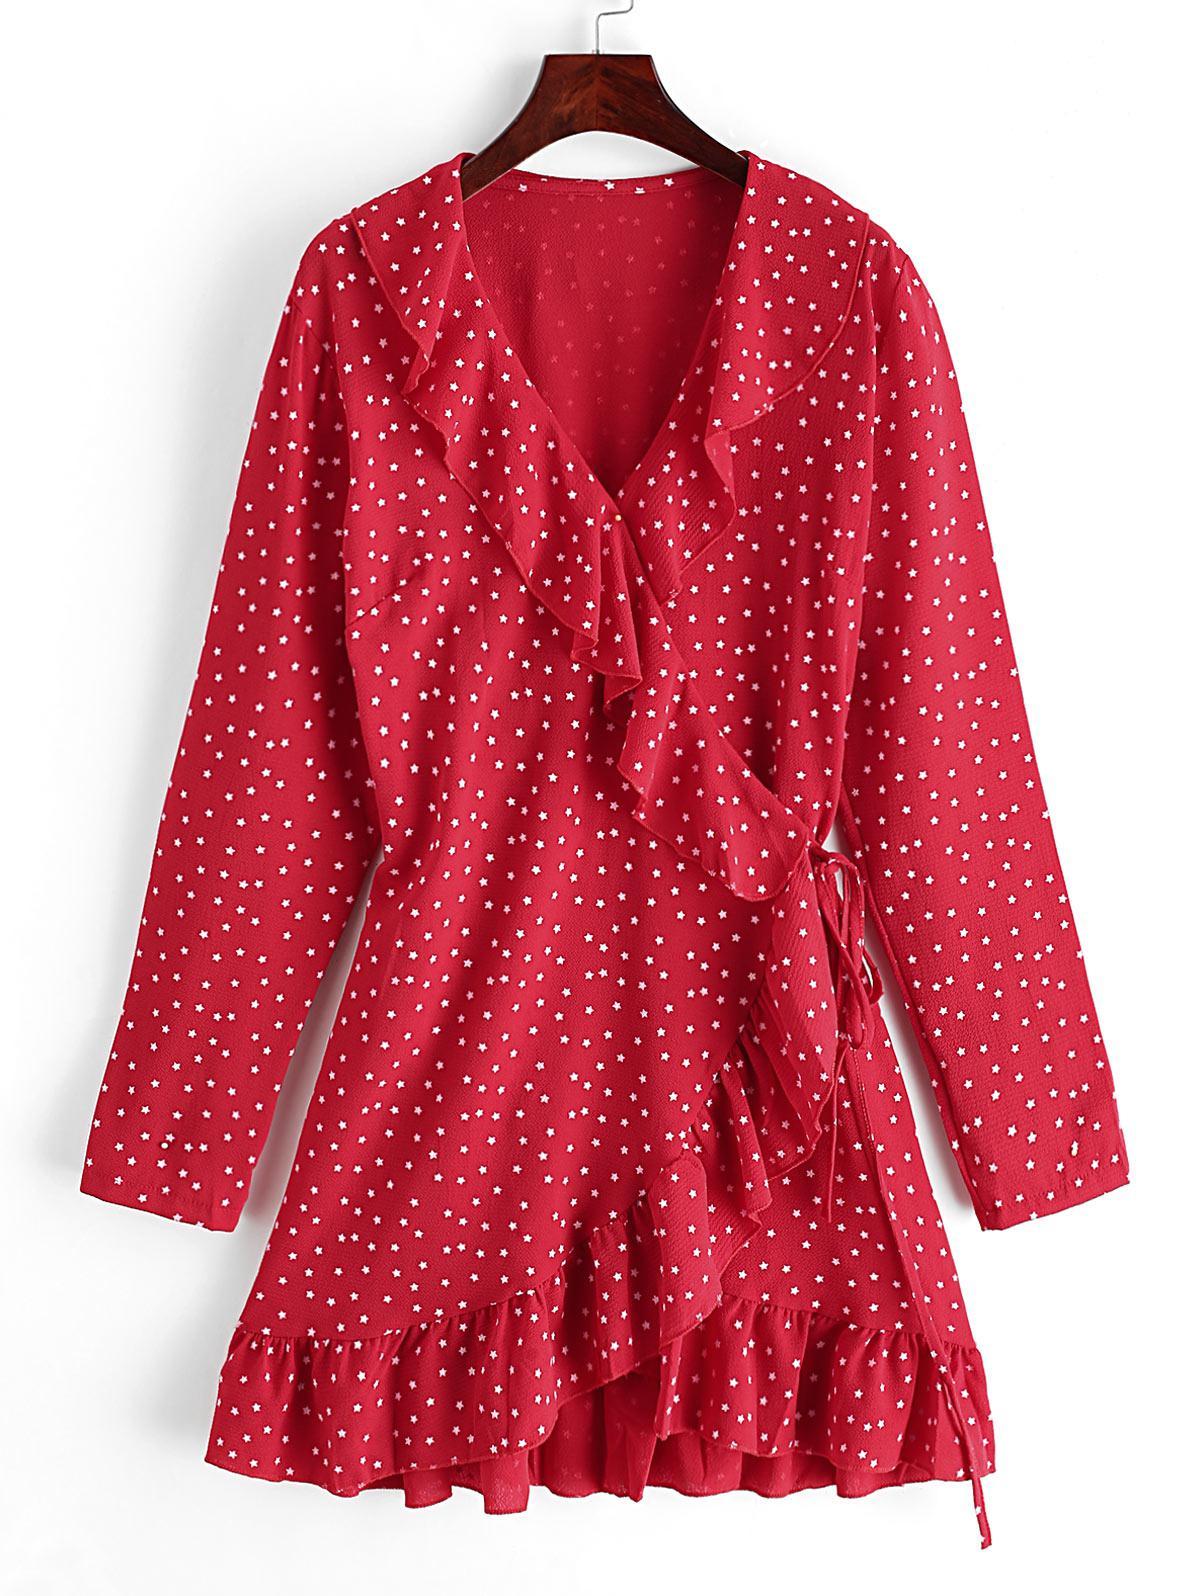 Dazzling Star Ruffles Wrap Mini Dress, Ruby red